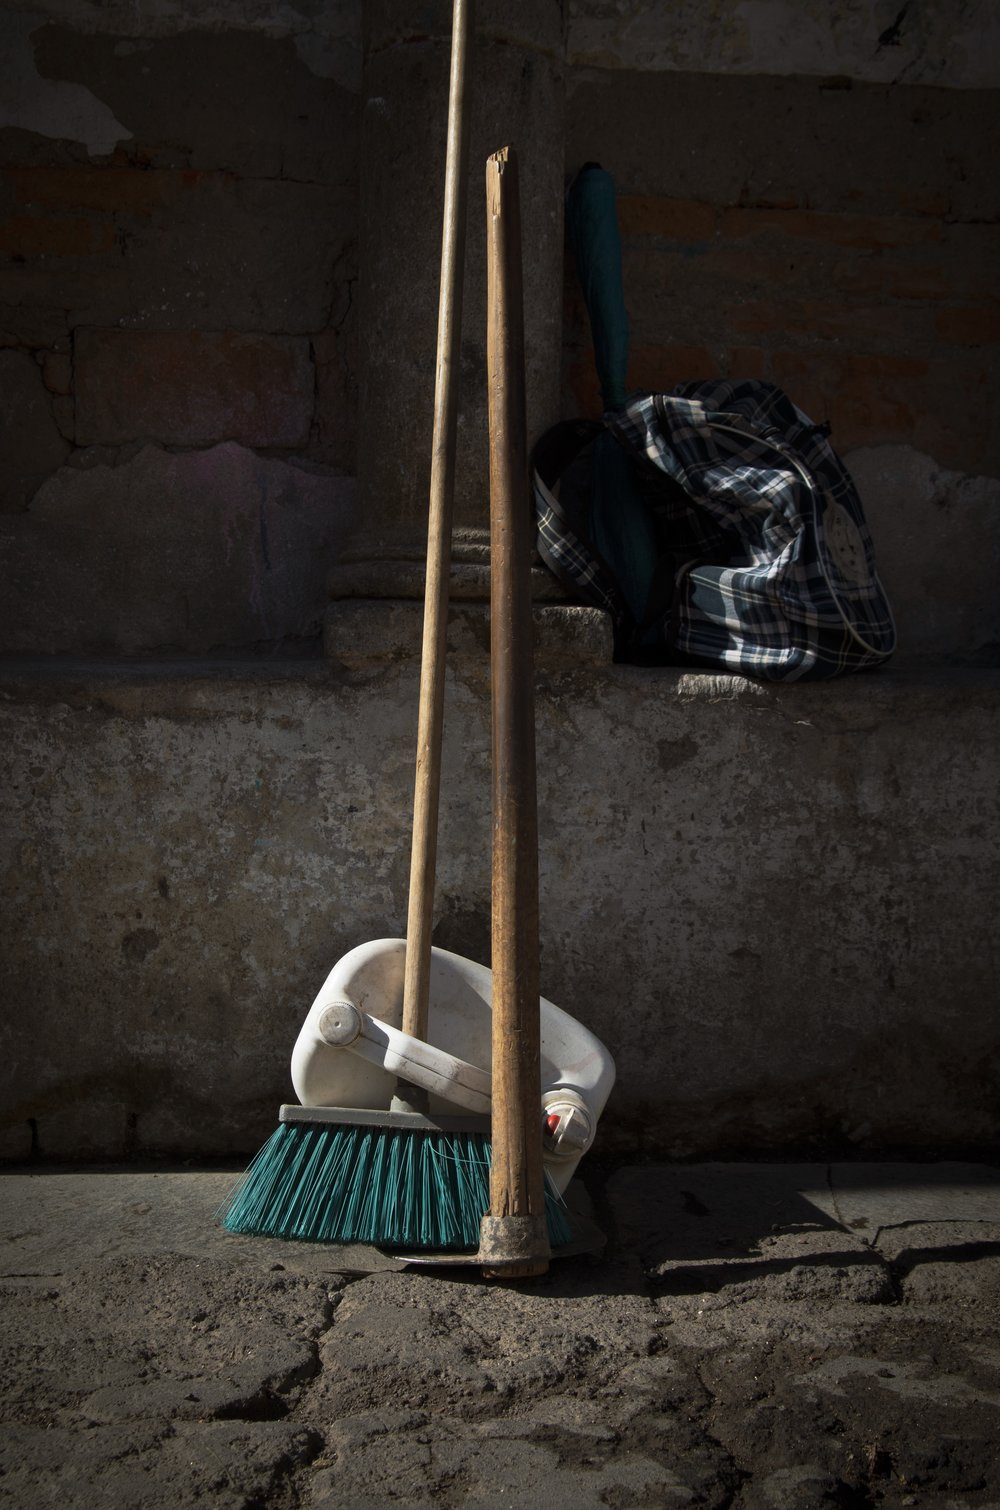 Beauty in the Mundane #2, Caretaker's Broom